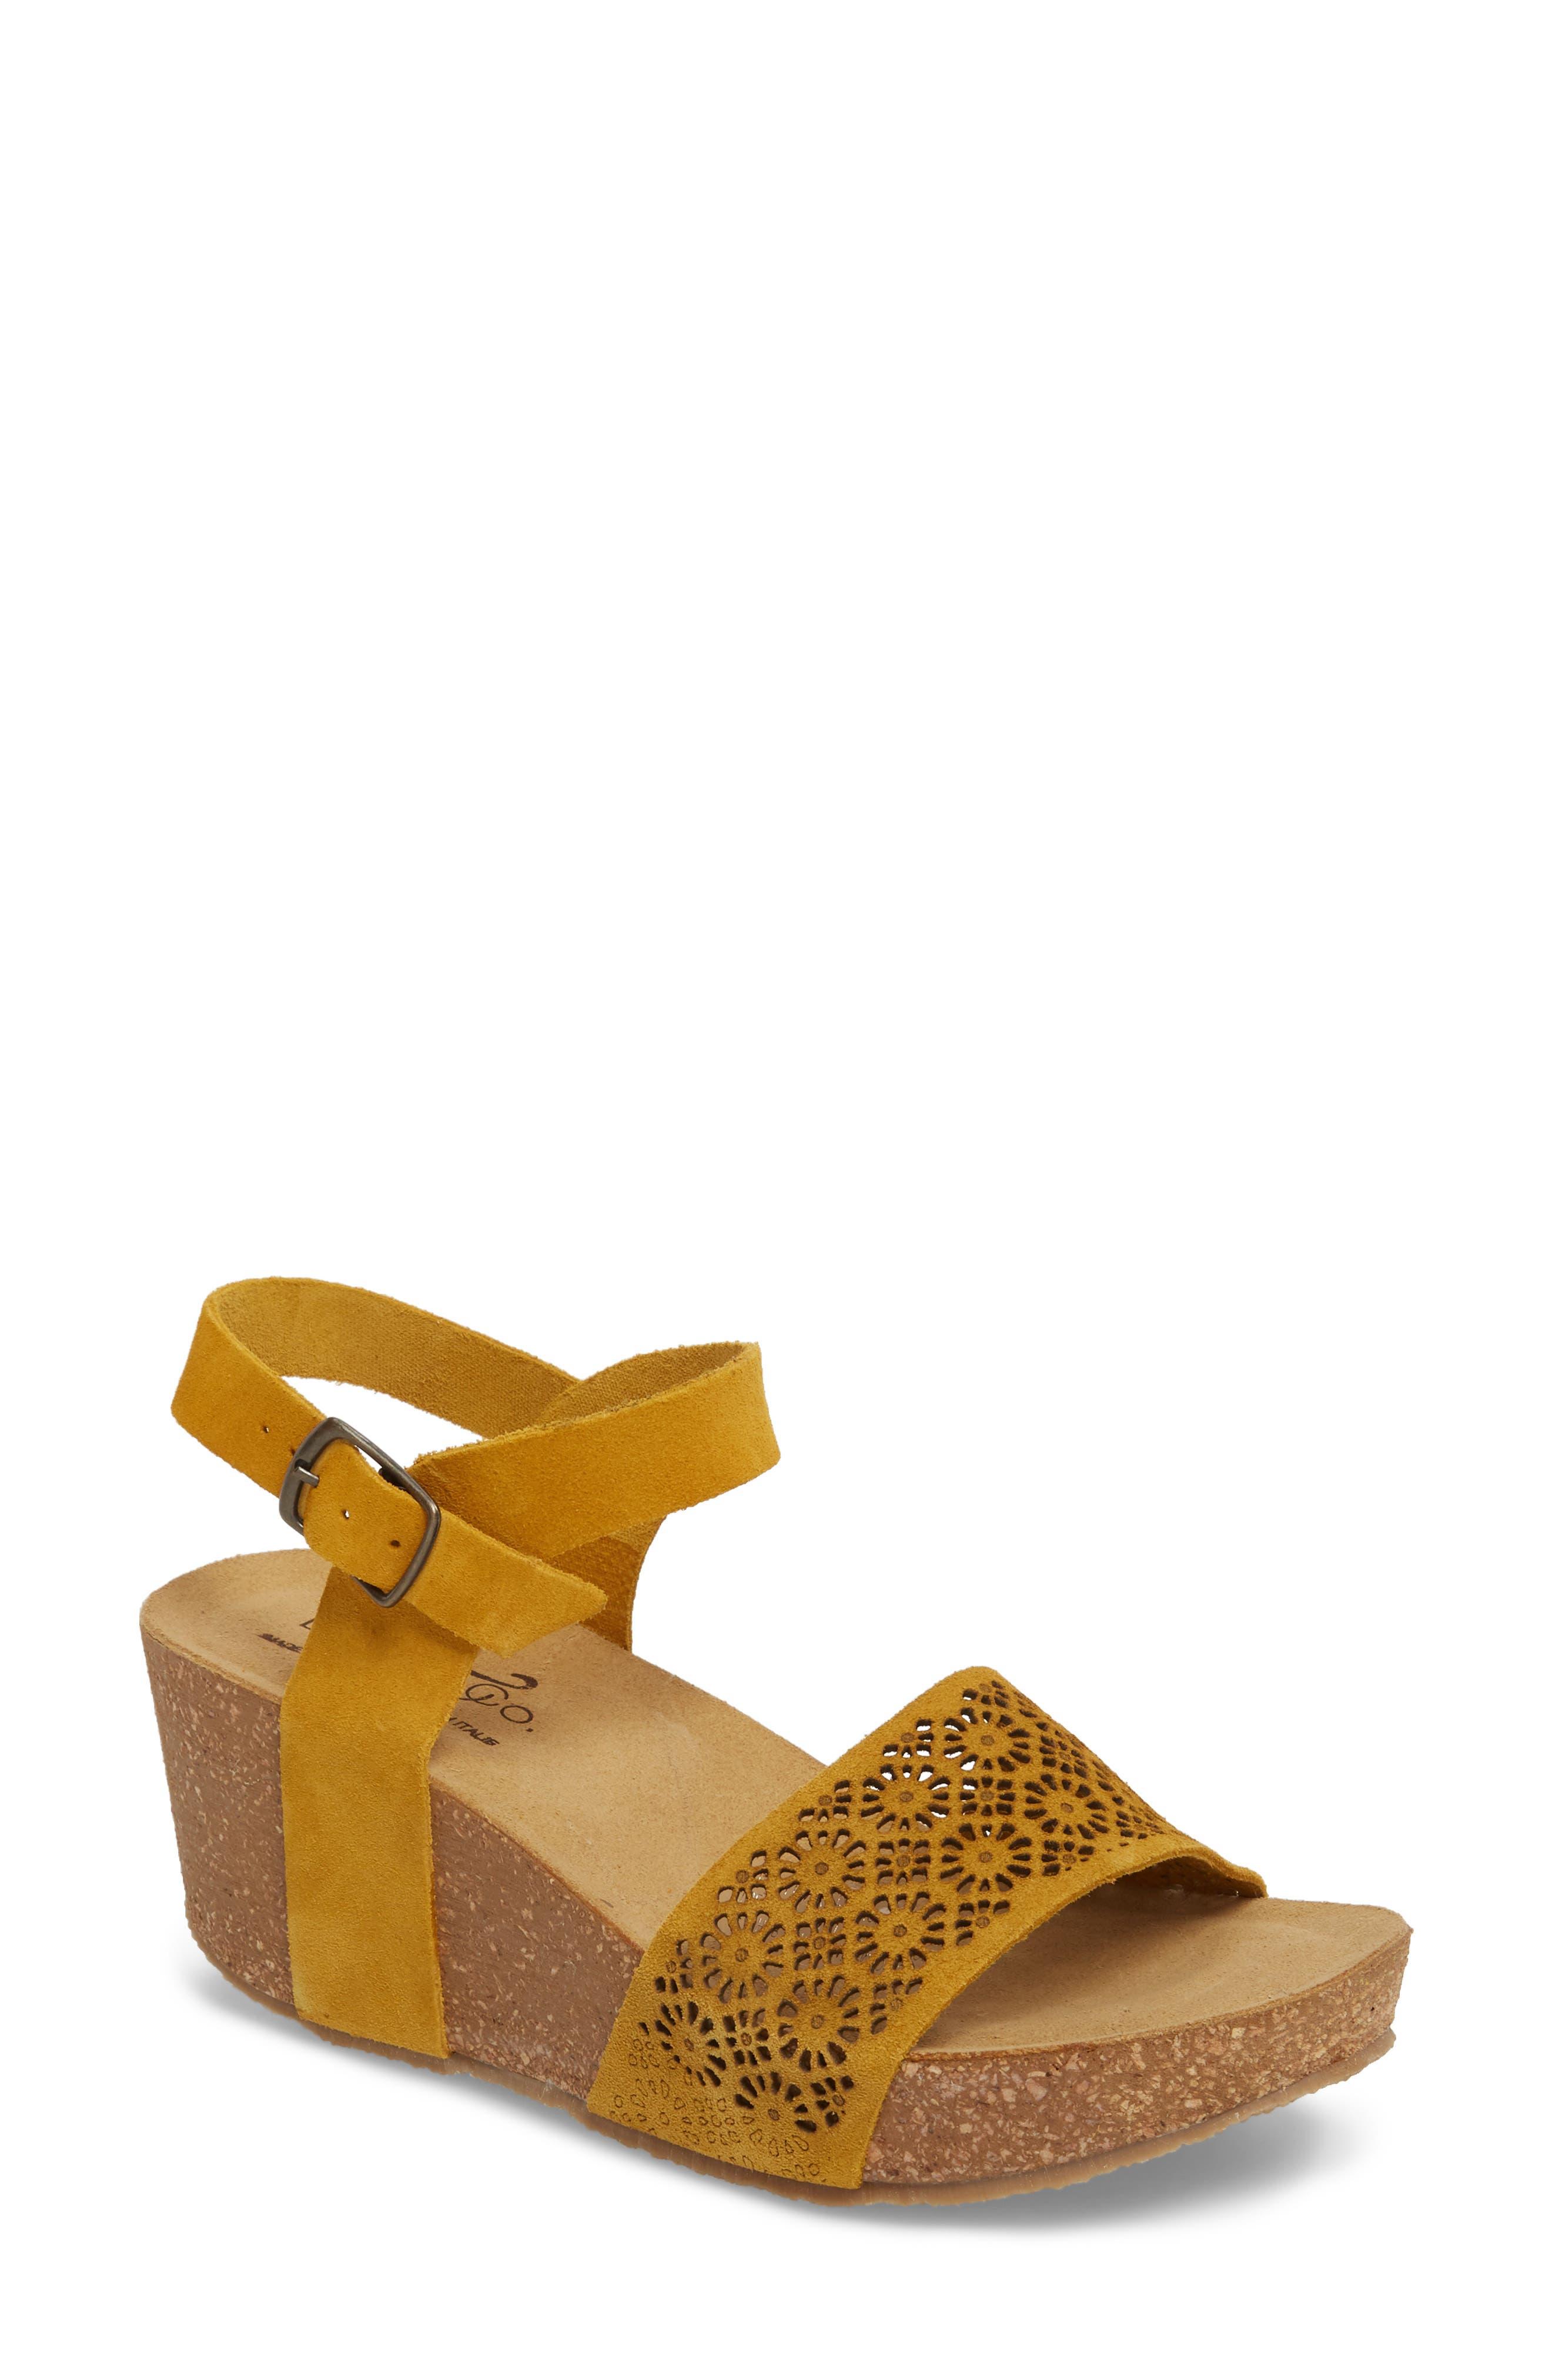 Bos. & Co. Lolo Platform Wedge Sandal, Yellow